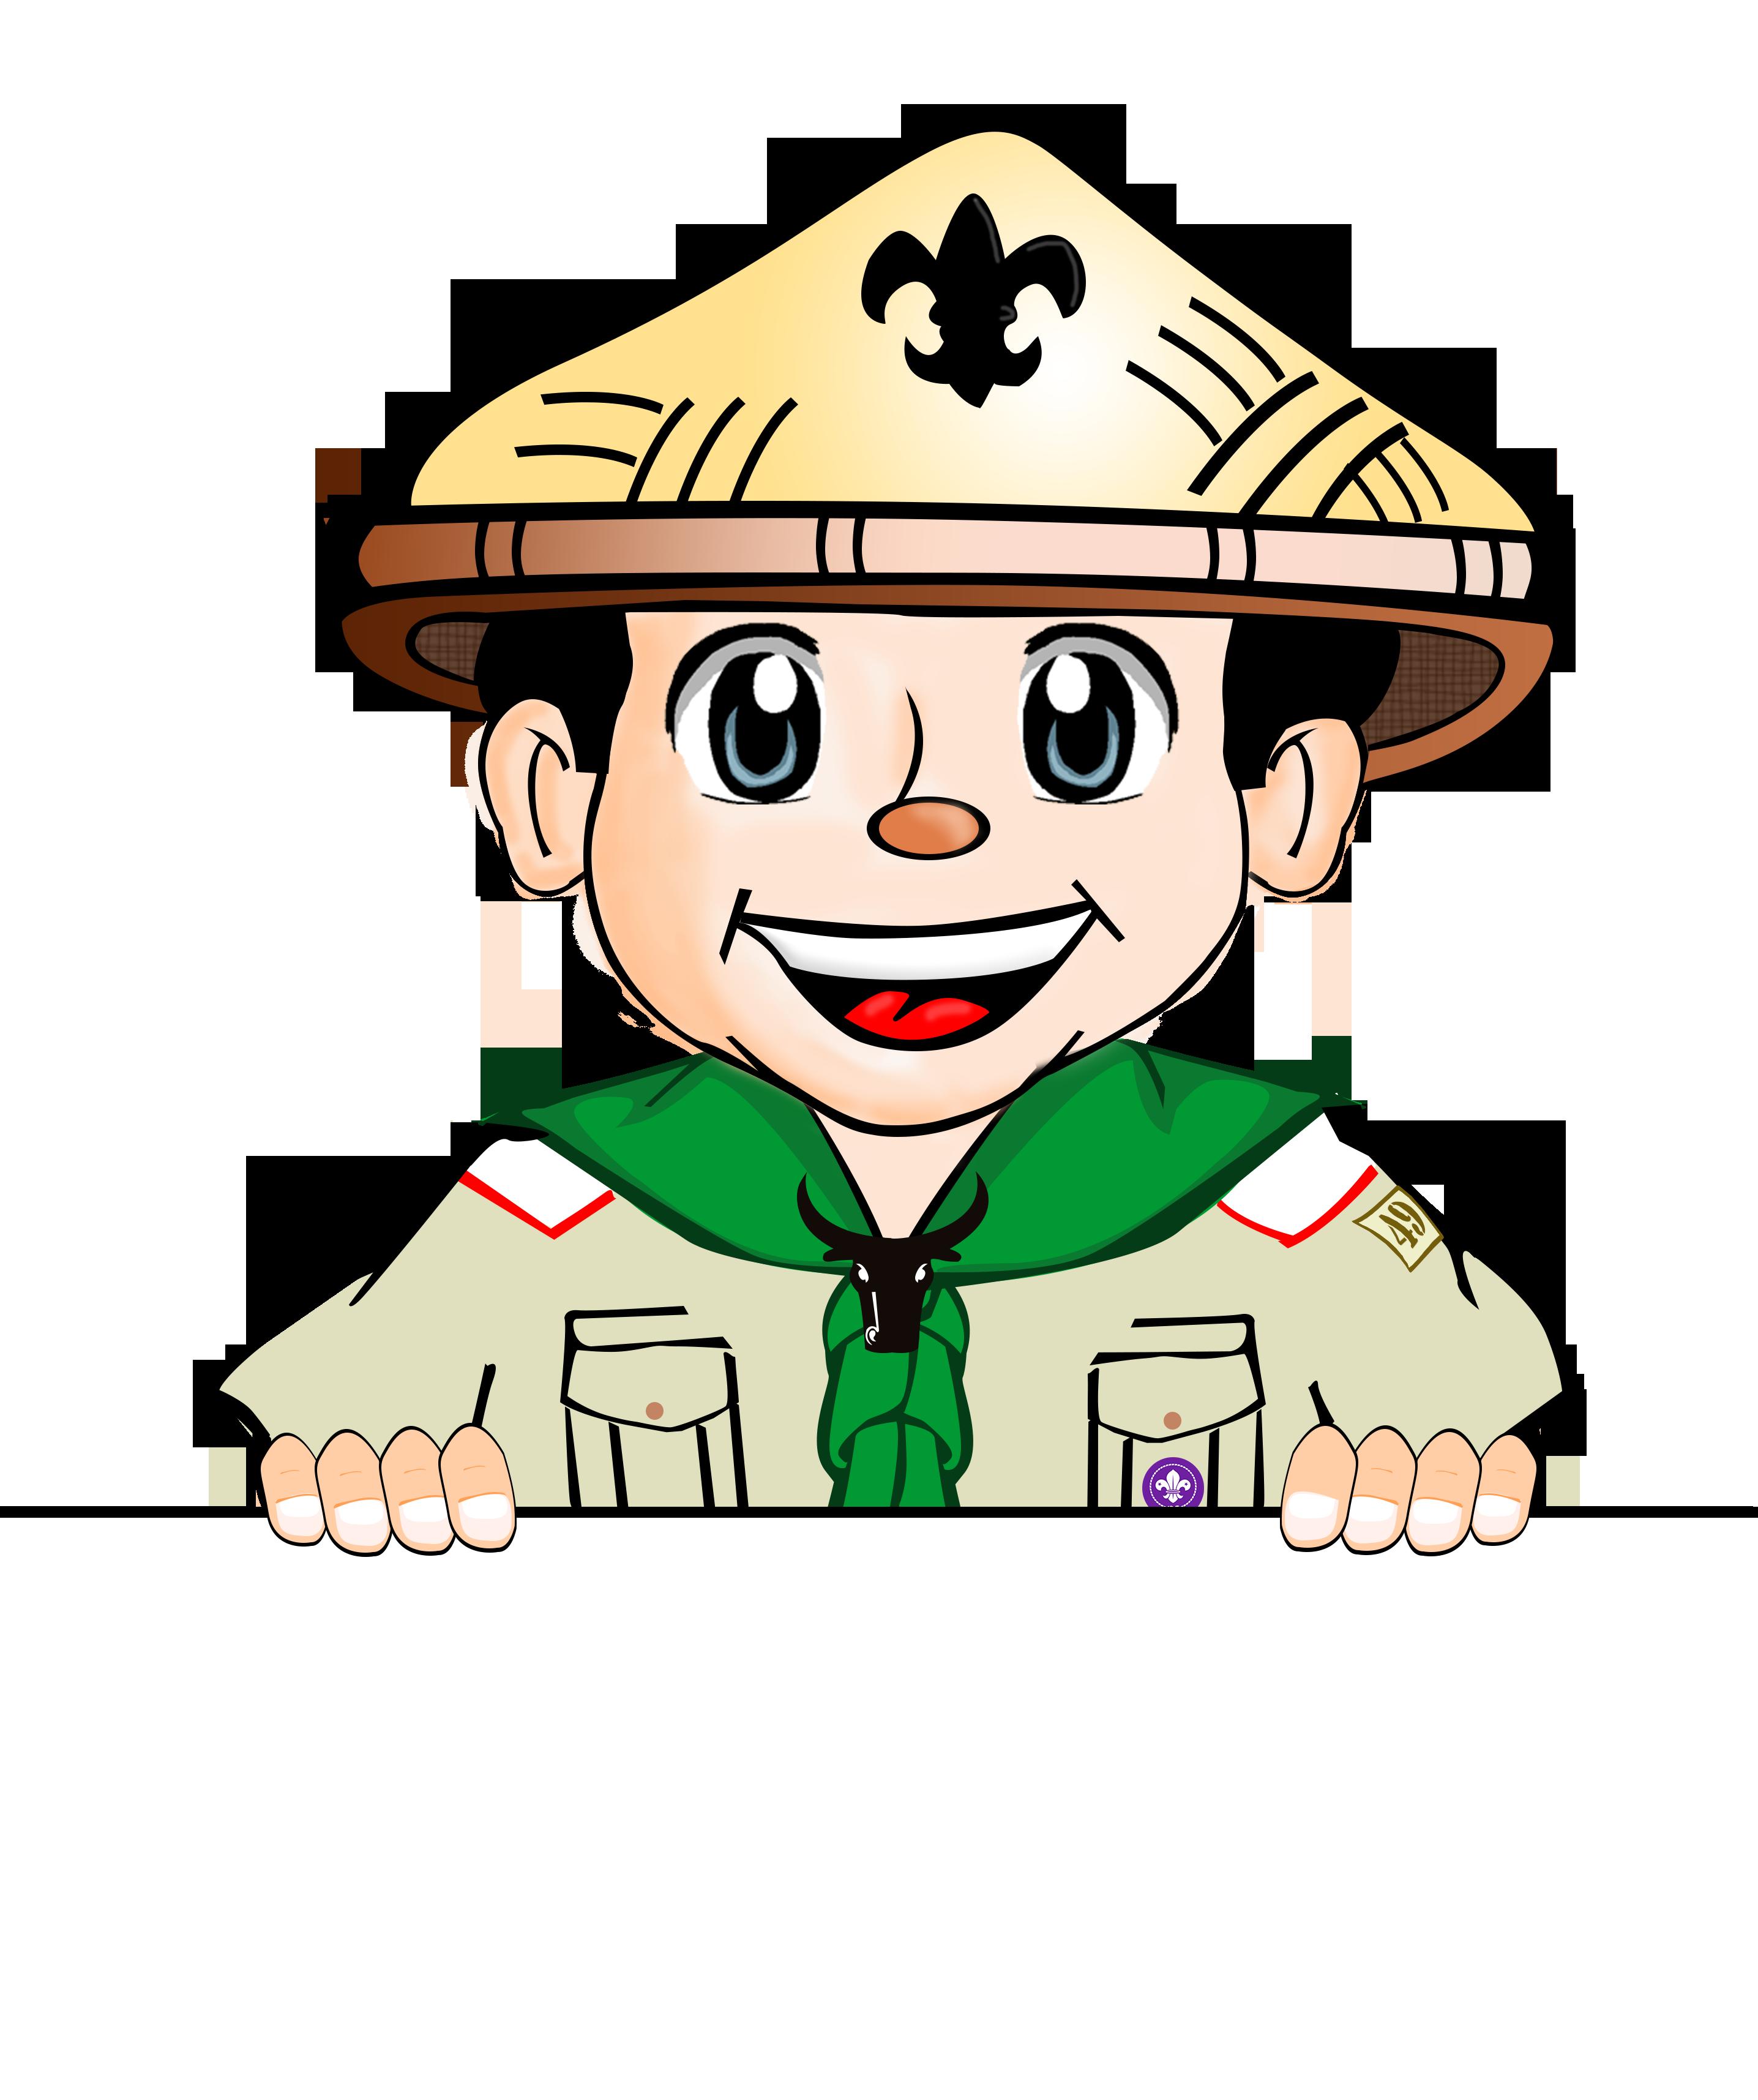 Boy scout cartoon clipart clipart transparent library Boy Scout Clipart | Free download best Boy Scout Clipart on ... clipart transparent library